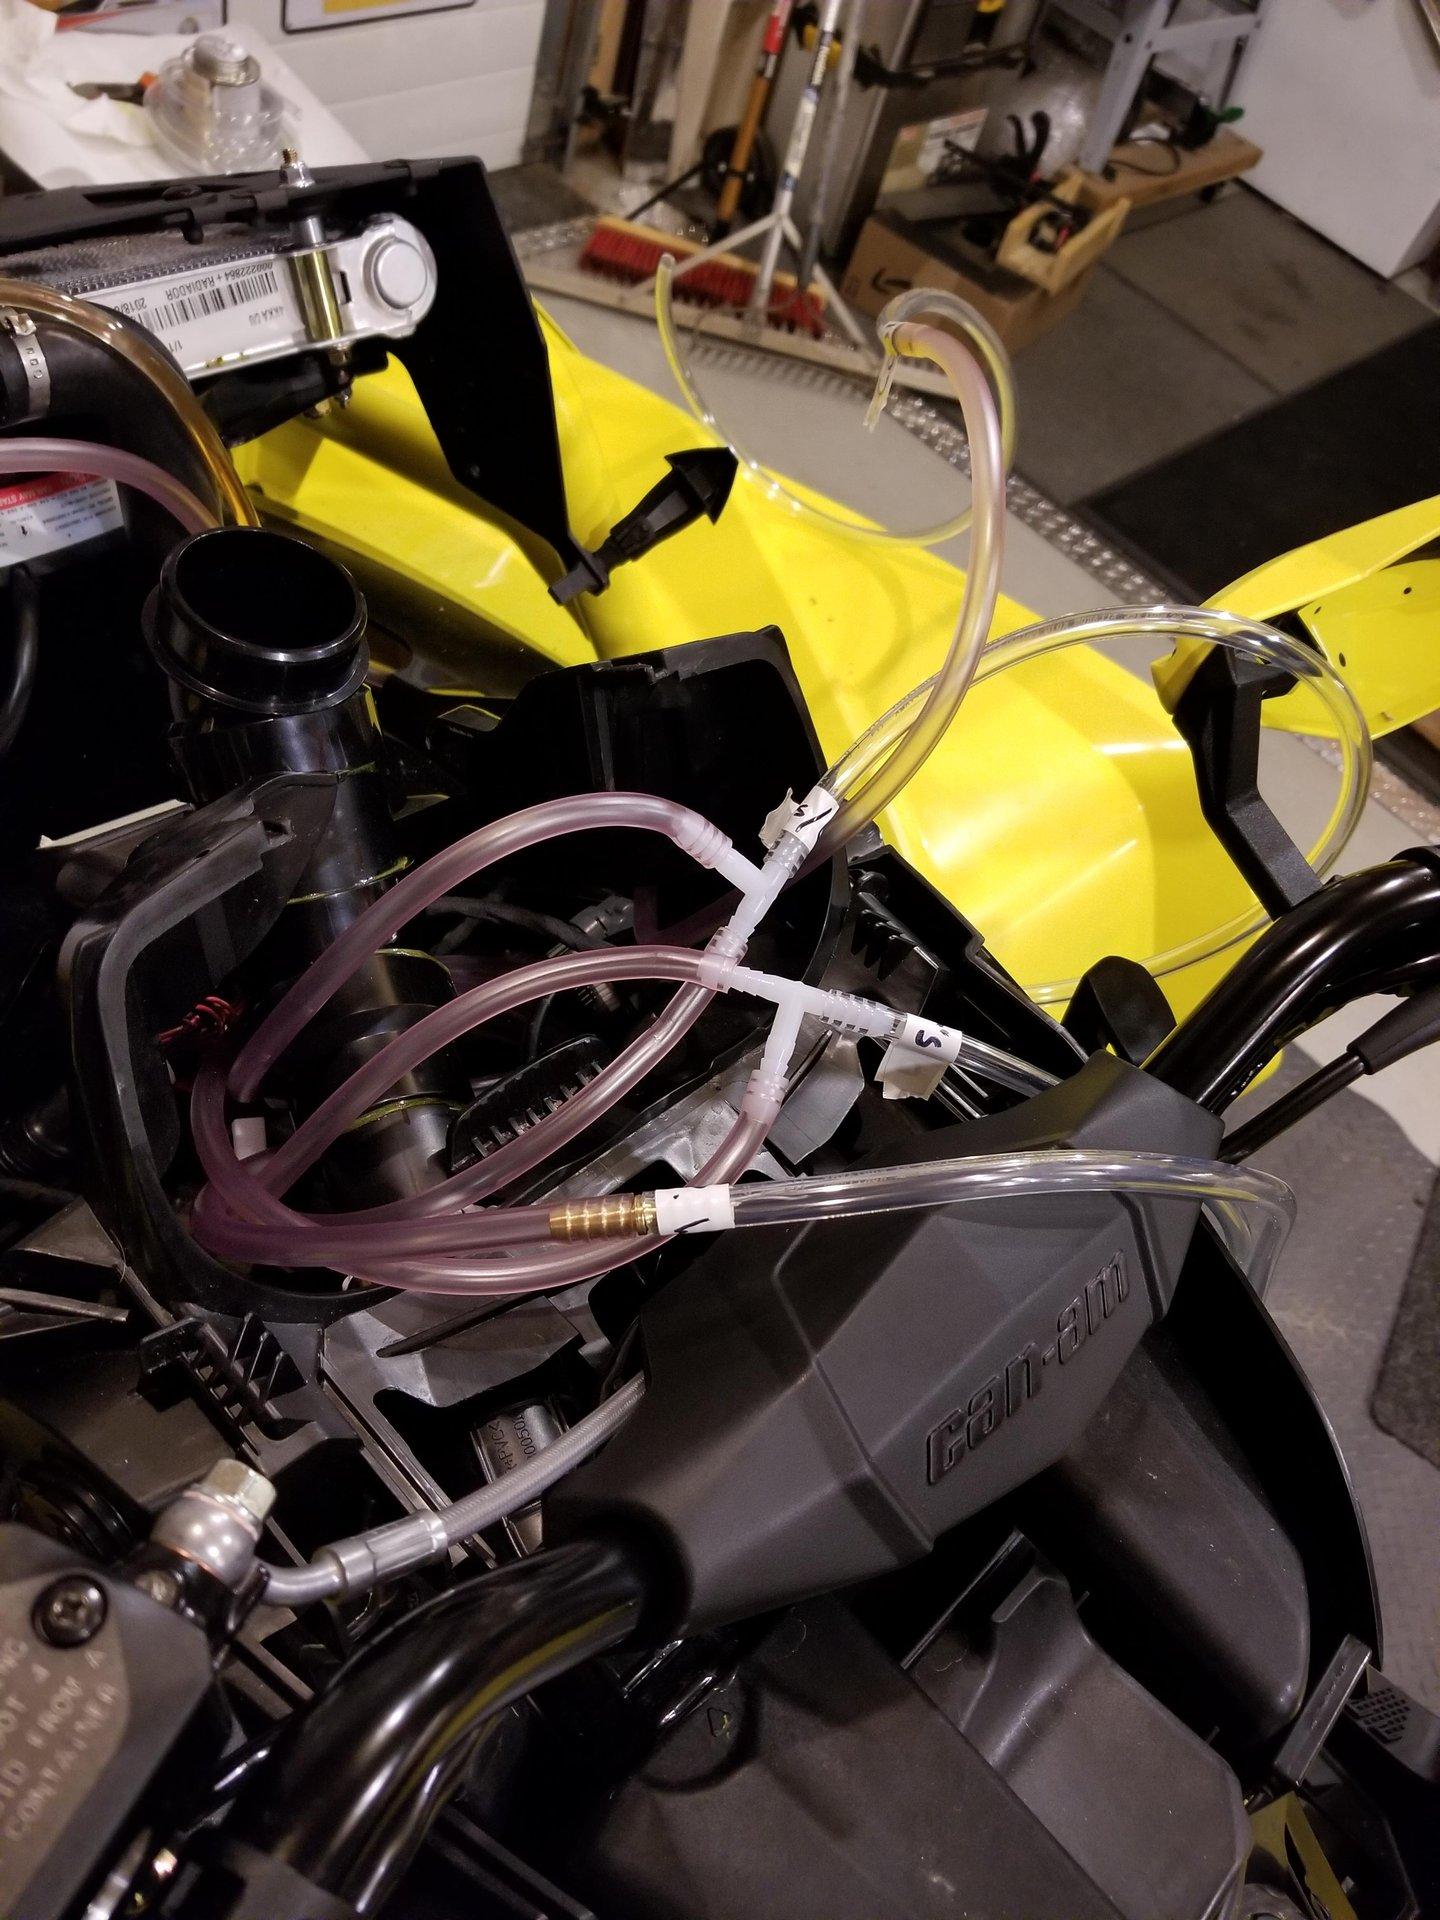 Shenker's DIY XMR Snorkel Riser Write-up (ARMUSVETS)   Can